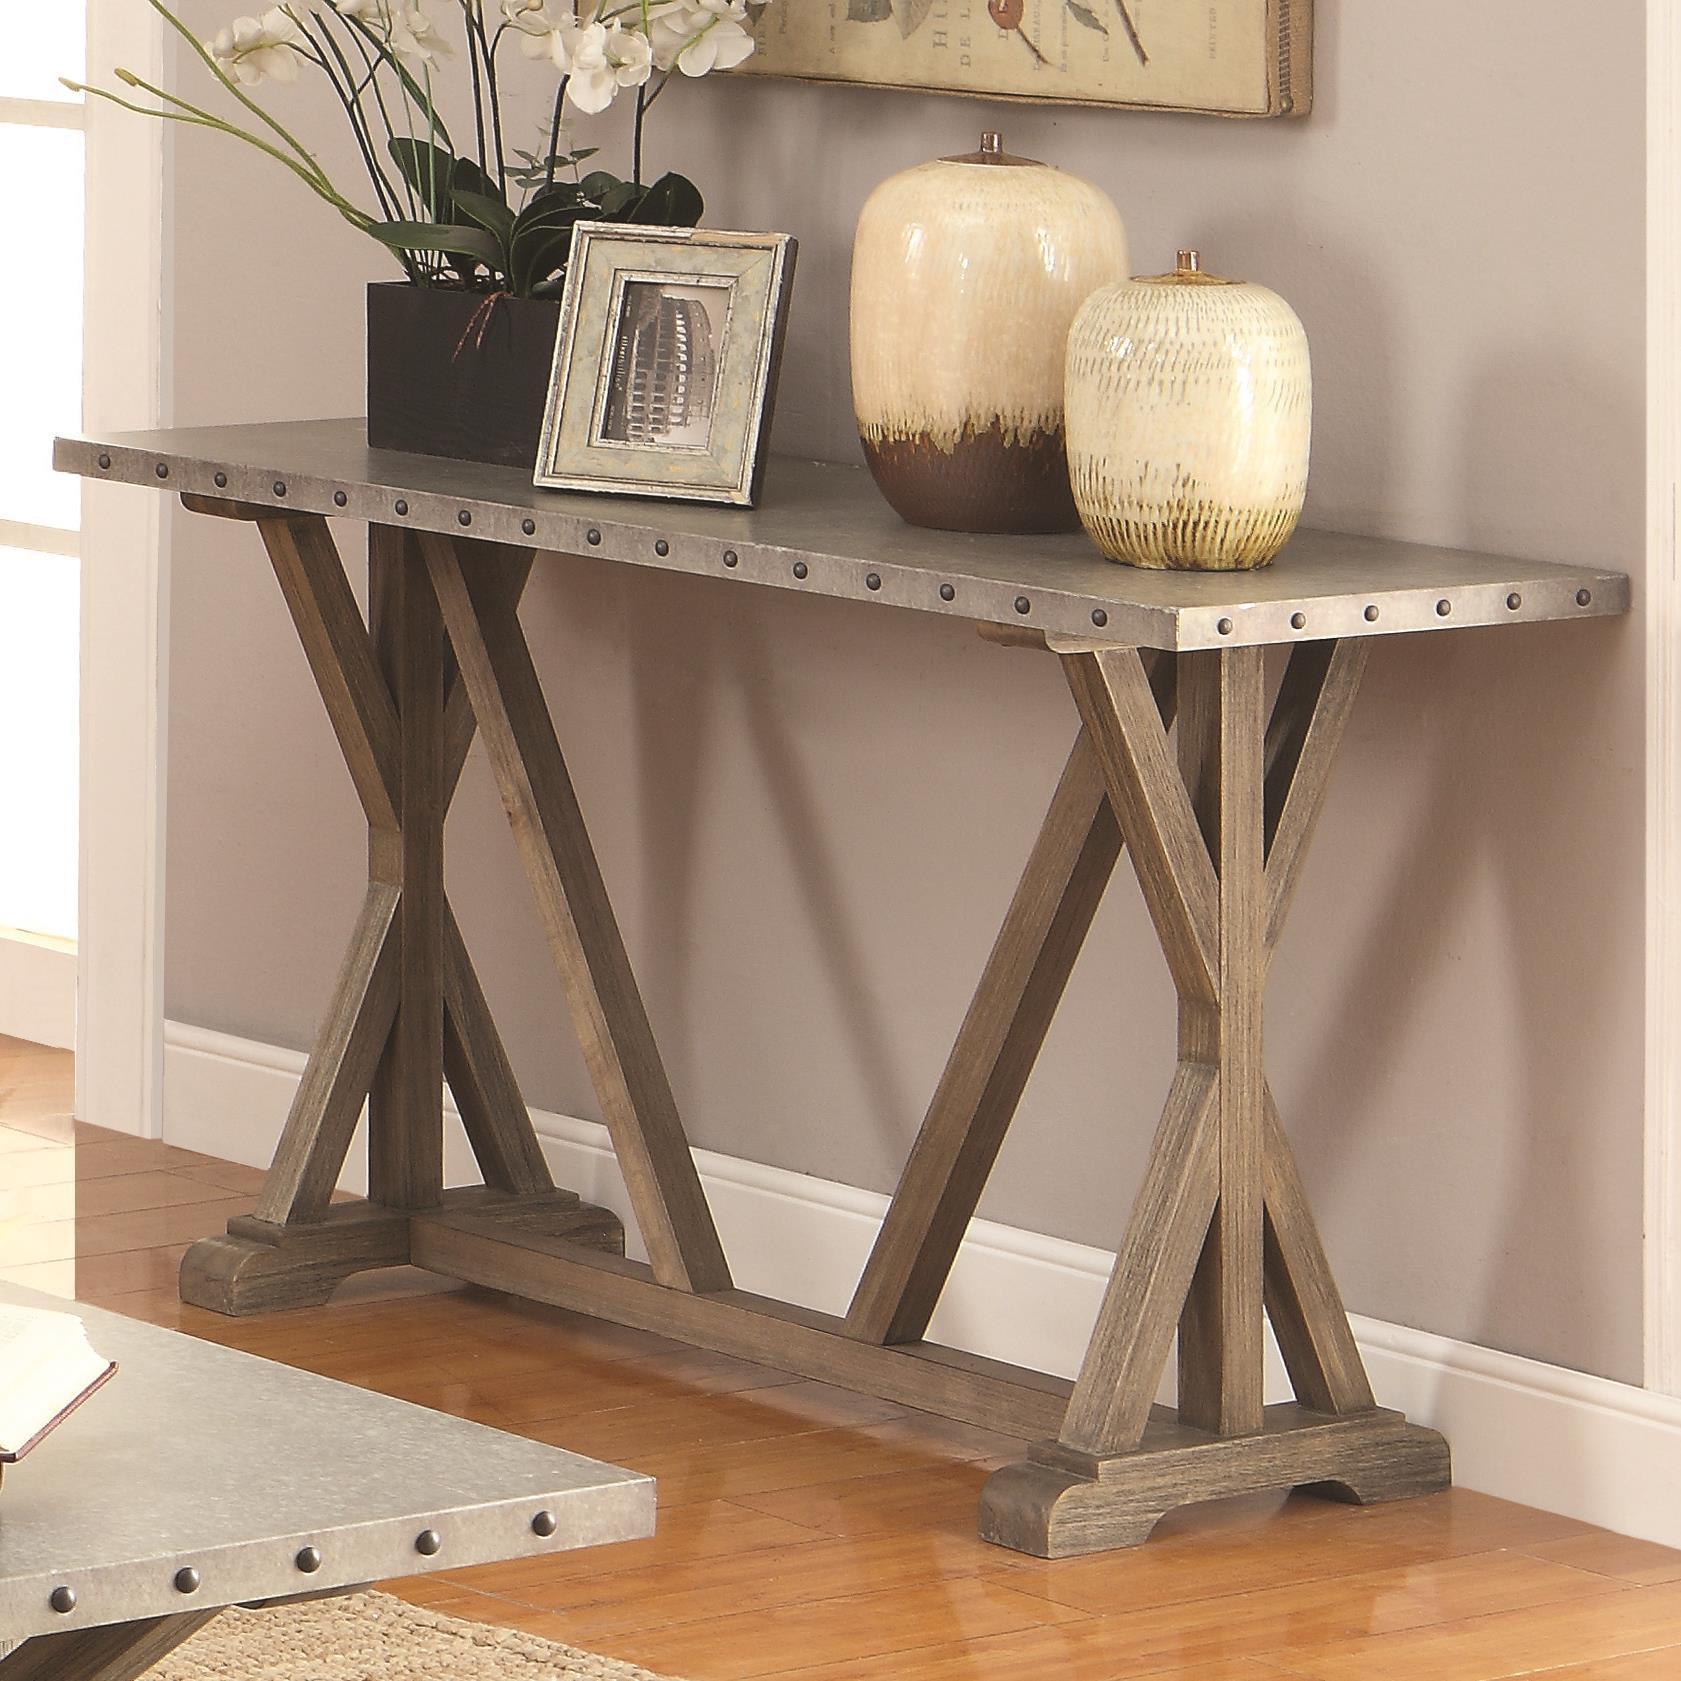 Coaster 70374 Industrial Sofa Table